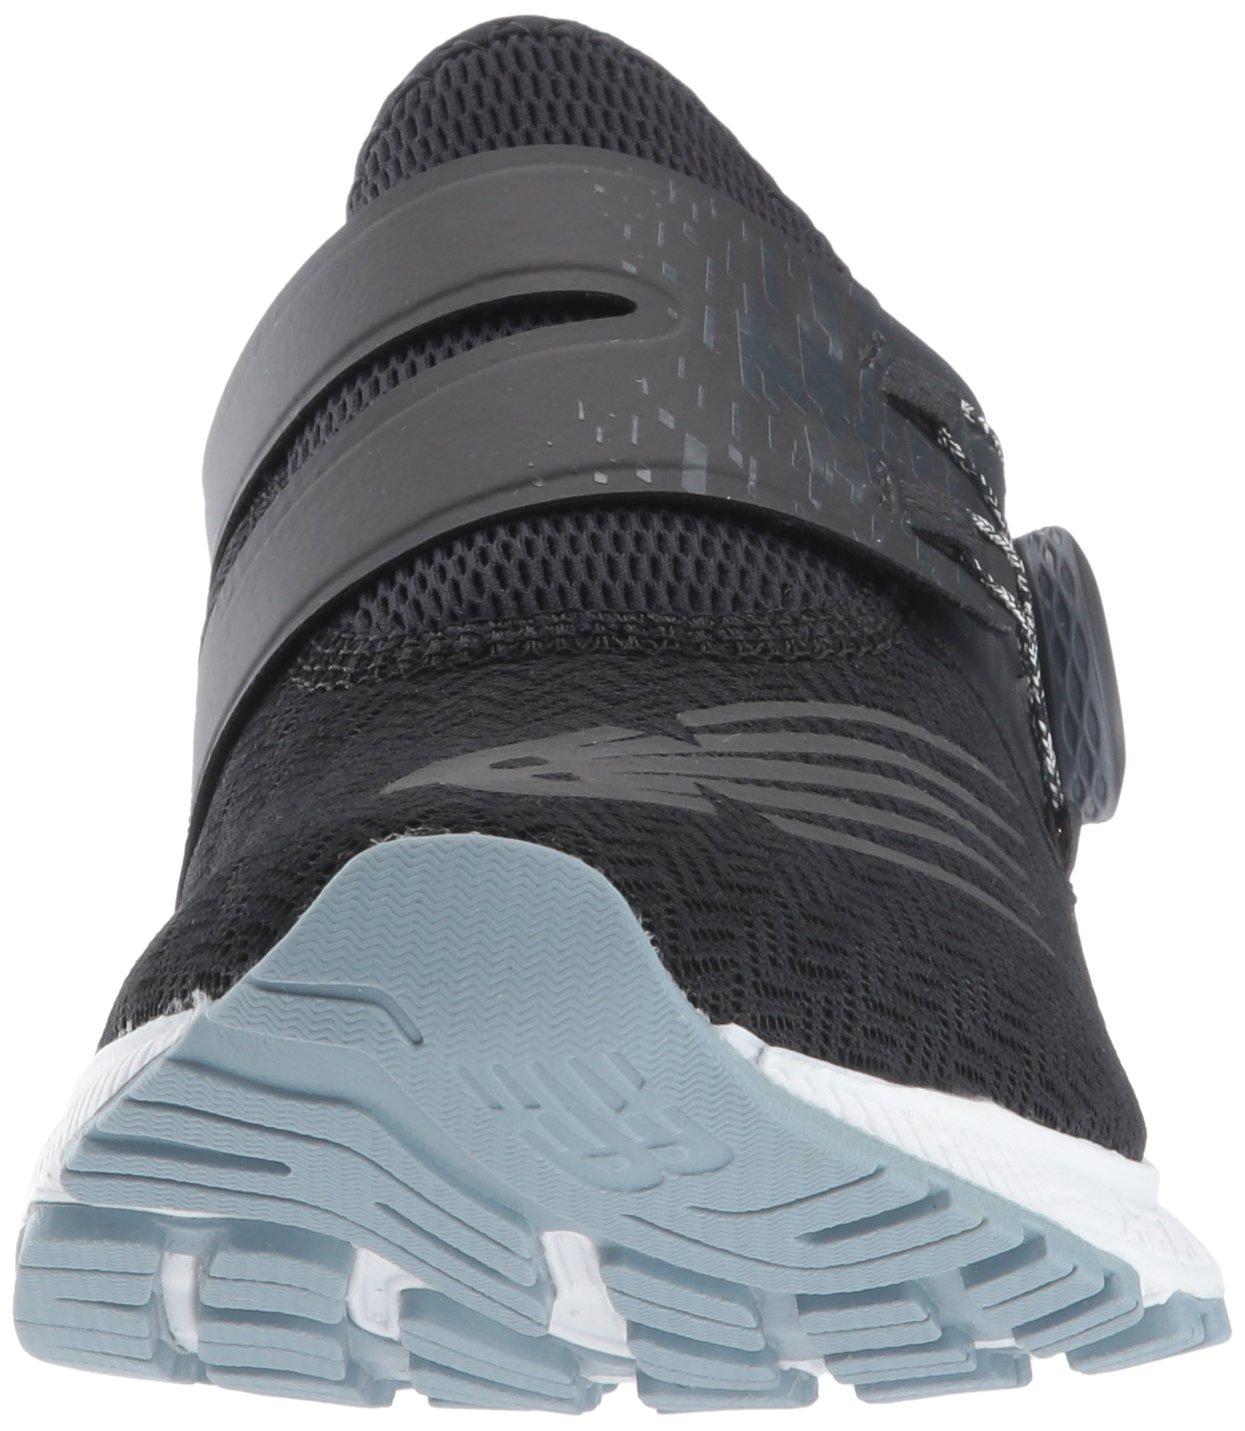 New Balance Shoe Women's Sonic V1 Running Shoe Balance B01NB9YNA7 10.5 D US|Black/Silver 6905bb